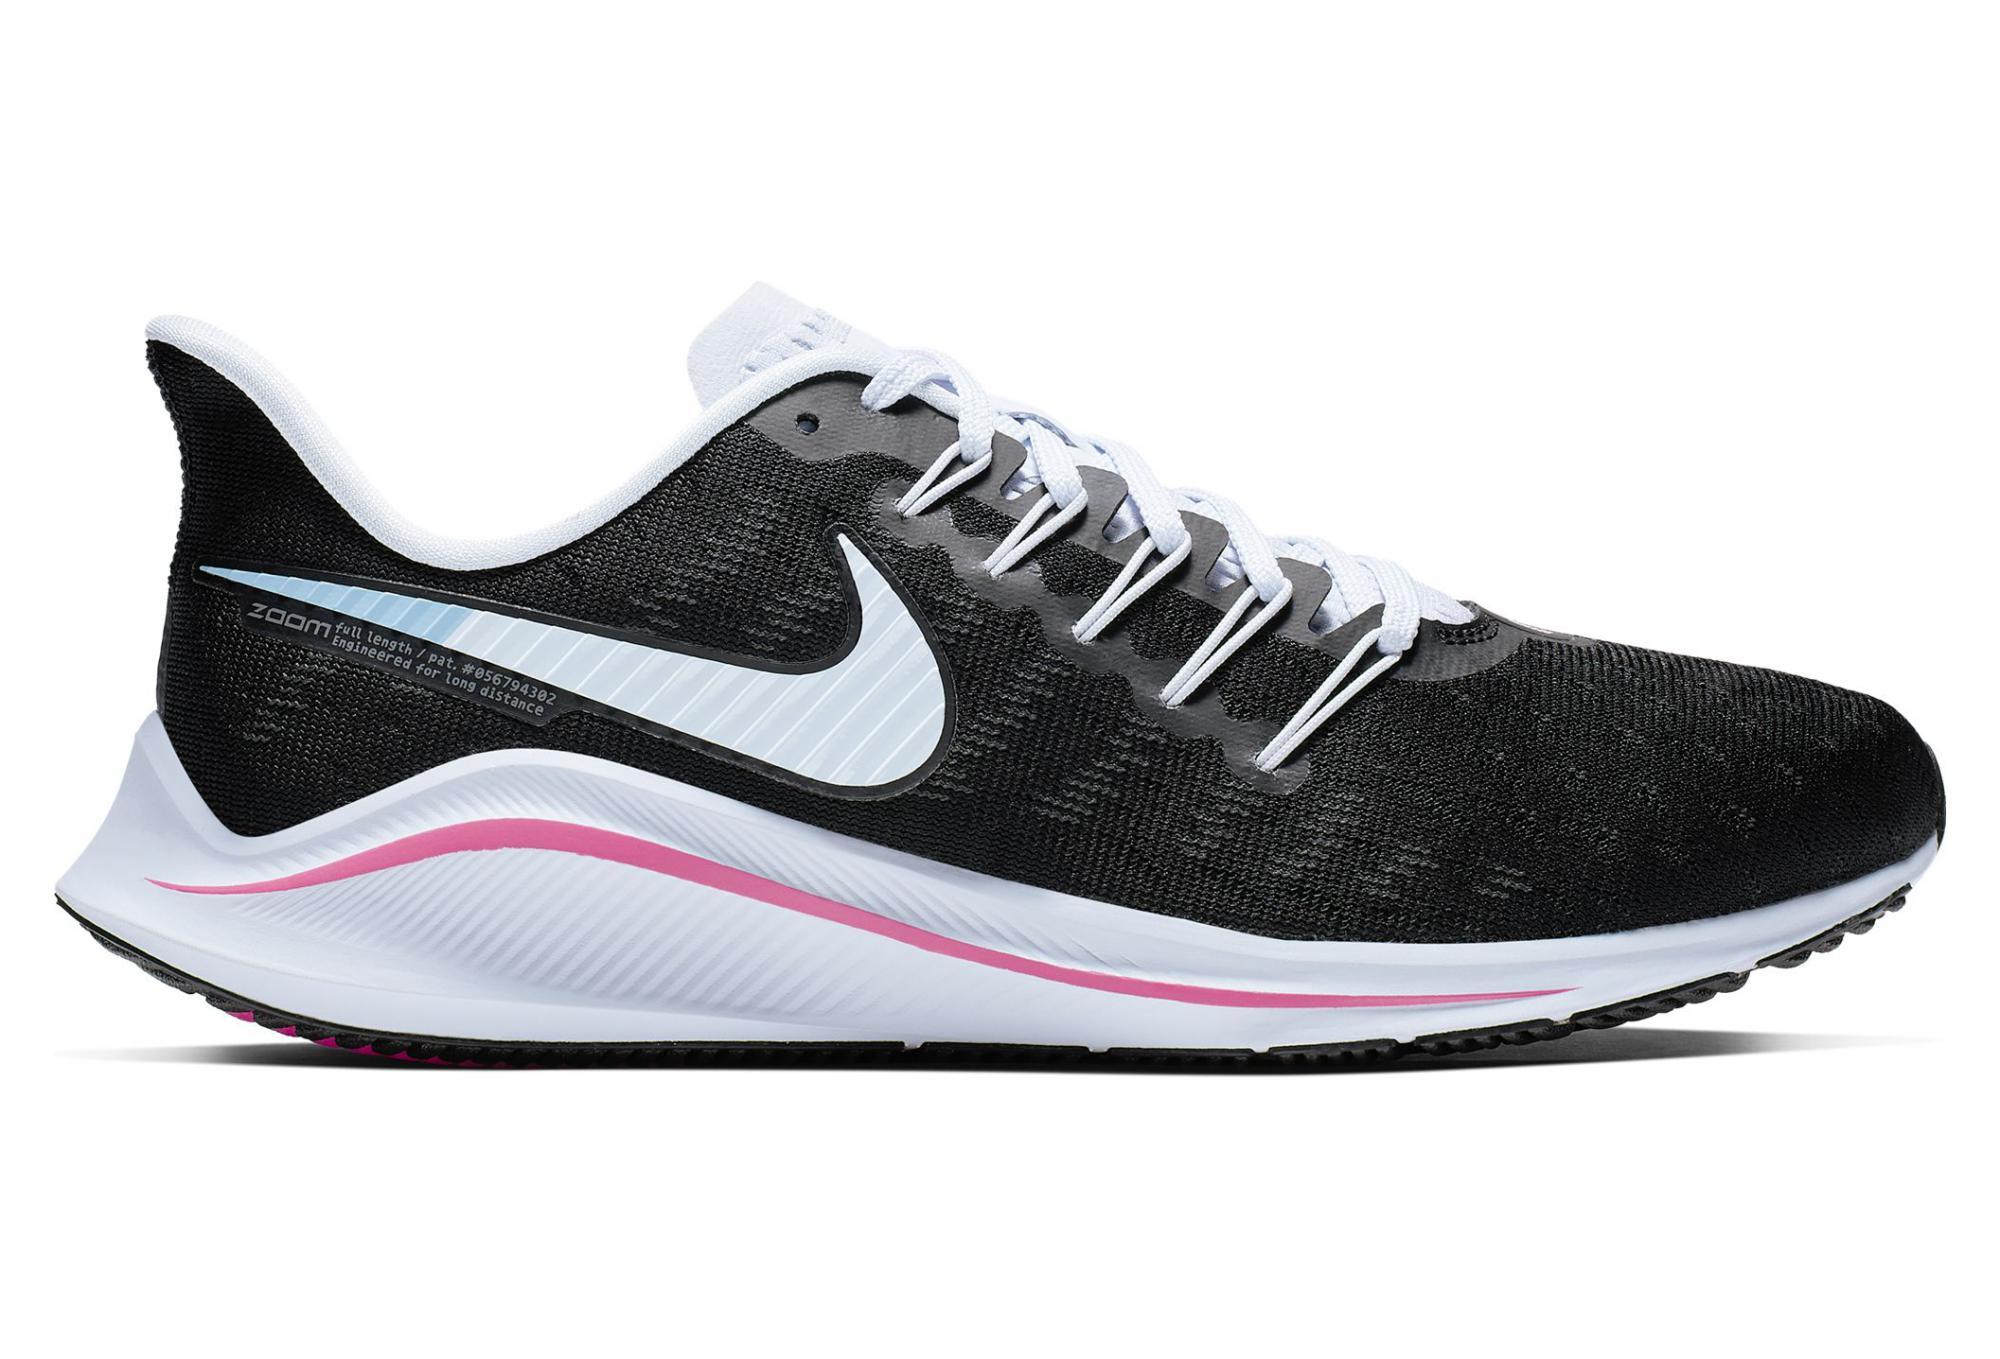 Nike Air Zoom Vomero 14 Black Pink Women